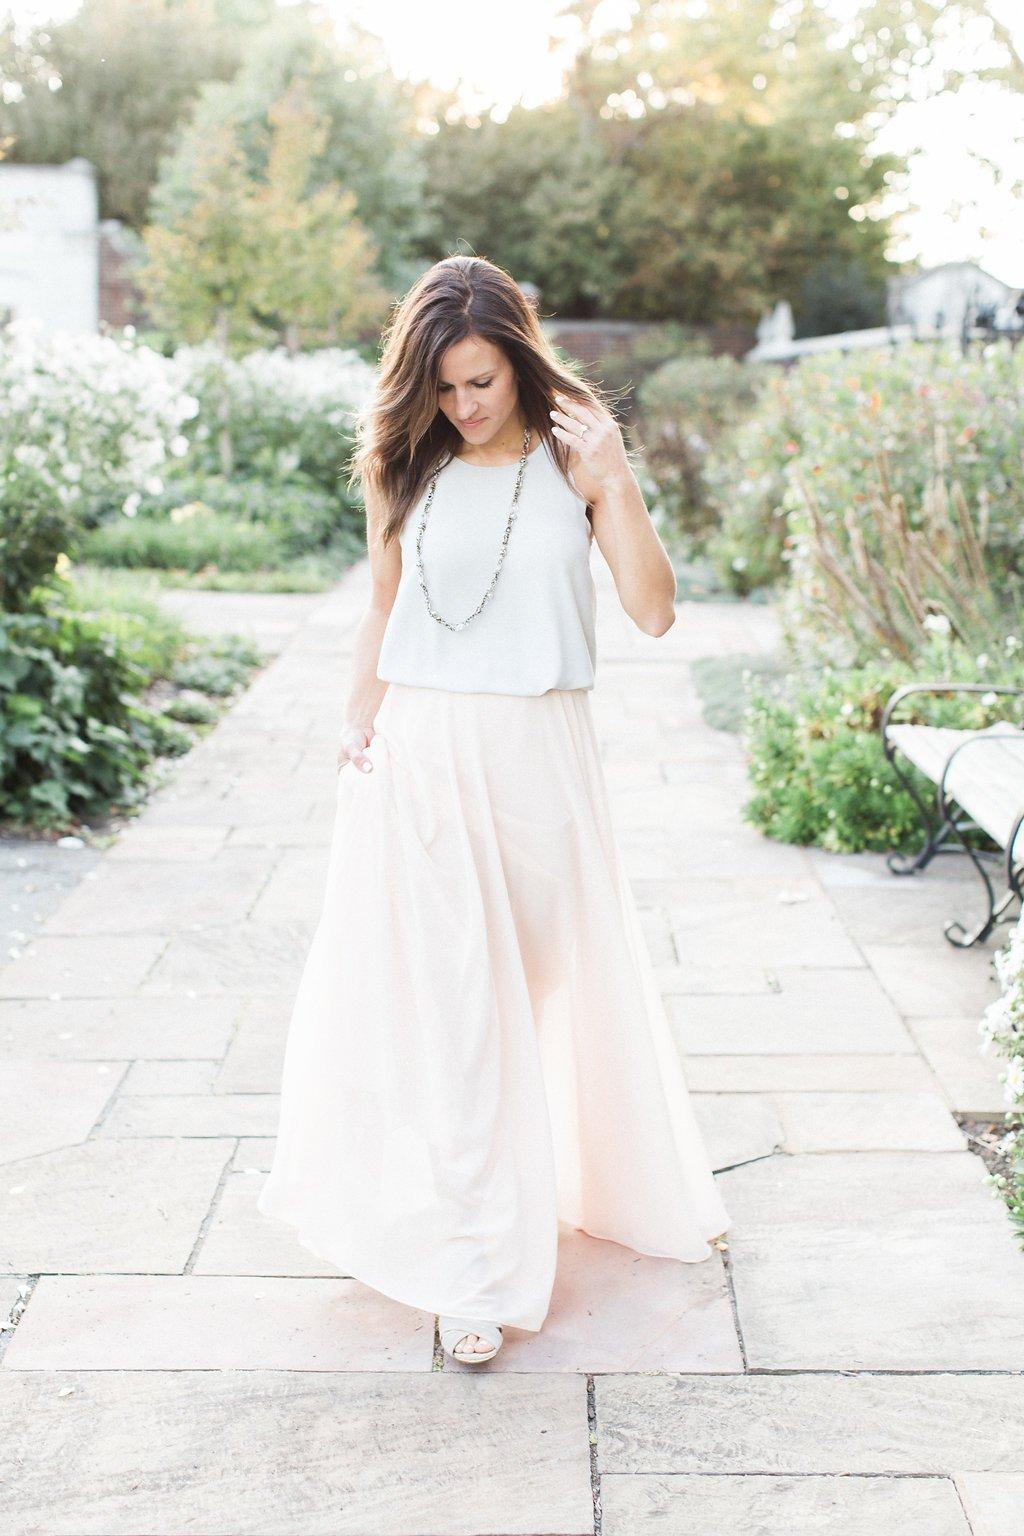 Bride walking wearing a light grey sleeveless top and flowing light pink skirt